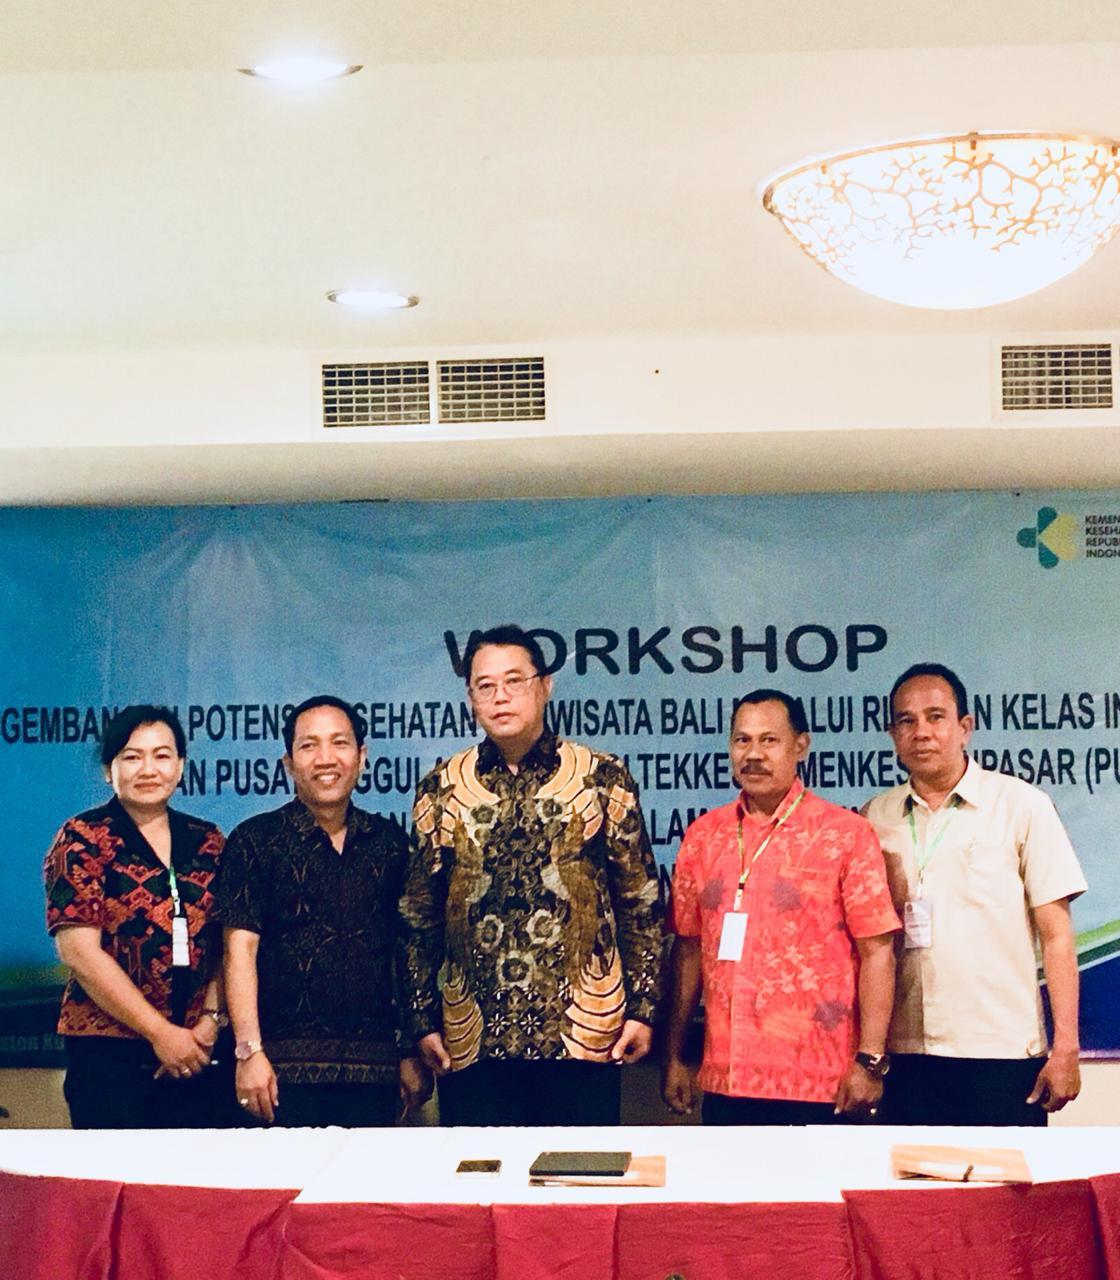 Workshop Pengembangan Potensi Kesehatan Pariwisata Melalui Rintisan Kelas Internasional (RKI) dan Pusat Unggulan Iptek Poltekkes Kemenkes (PUI-PK) Layanan Tradisional Dalam Kesehatan Pariwisata Poltekkes Kemenkes Denpasar